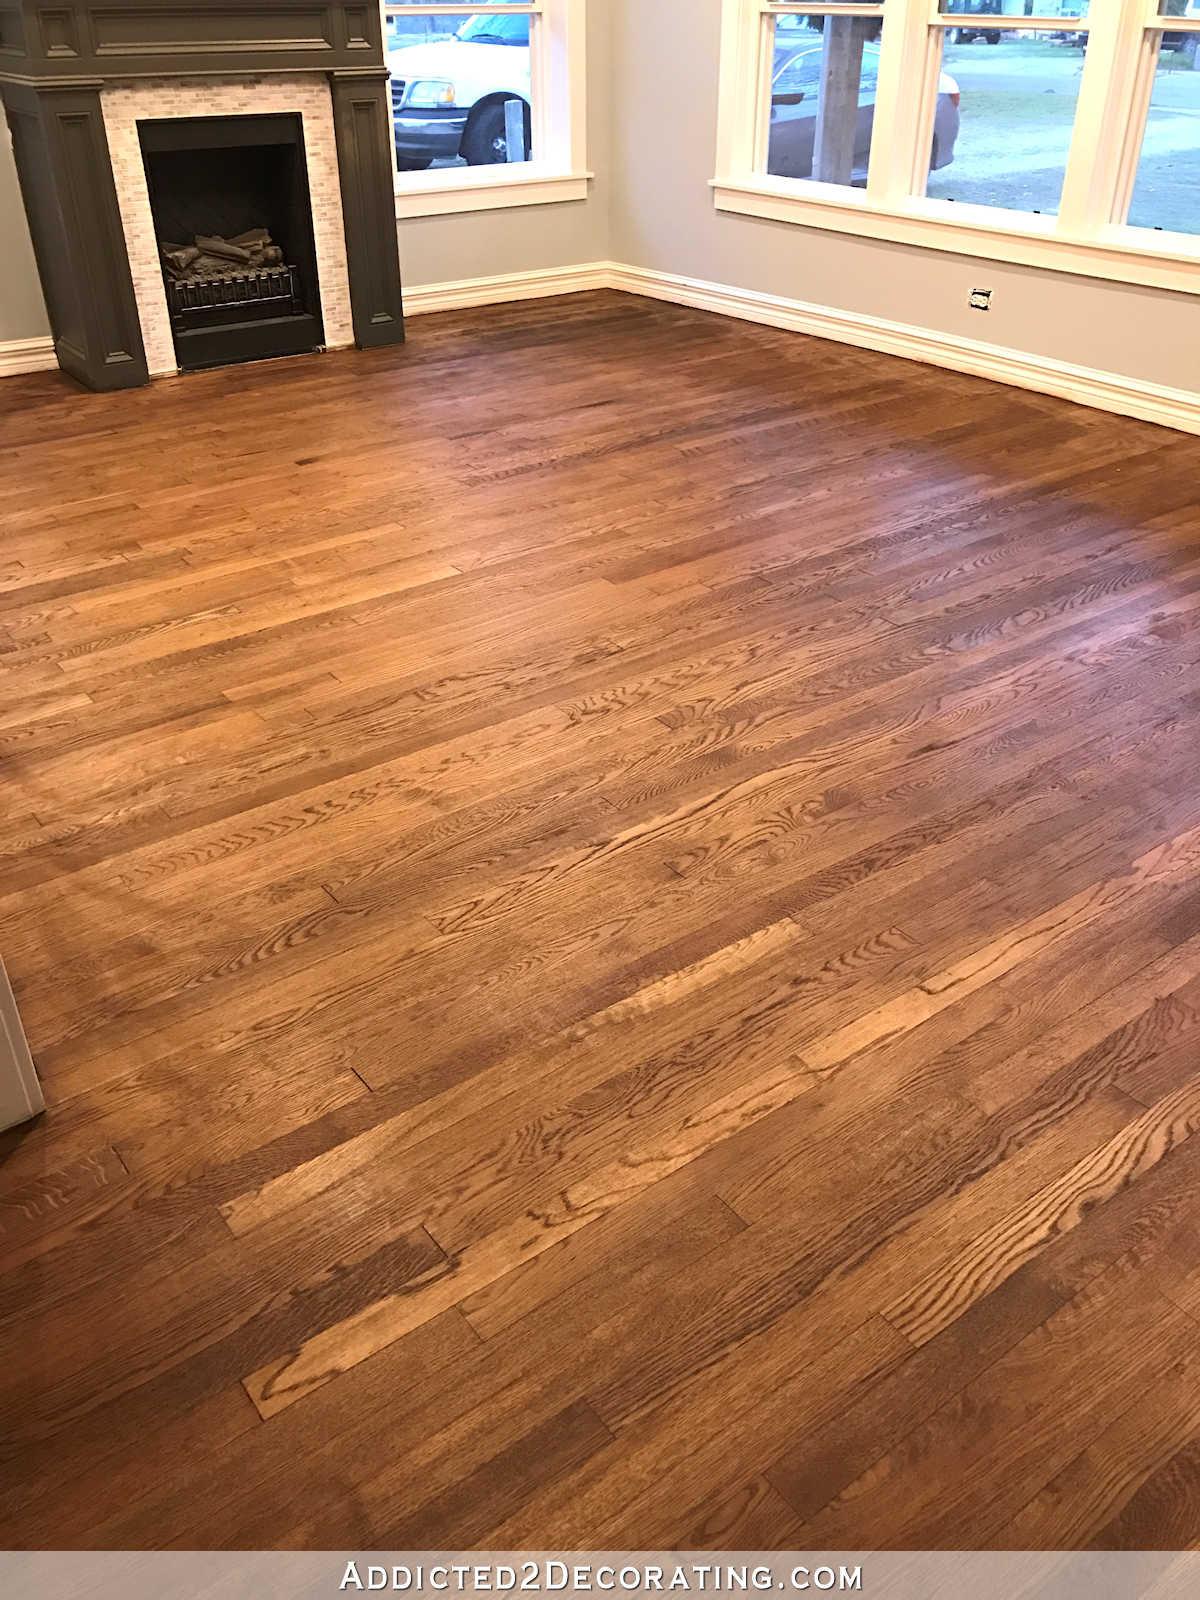 change hardwood floor stain color of adventures in staining my red oak hardwood floors products process for staining red oak hardwood floors 8a living room and entryway